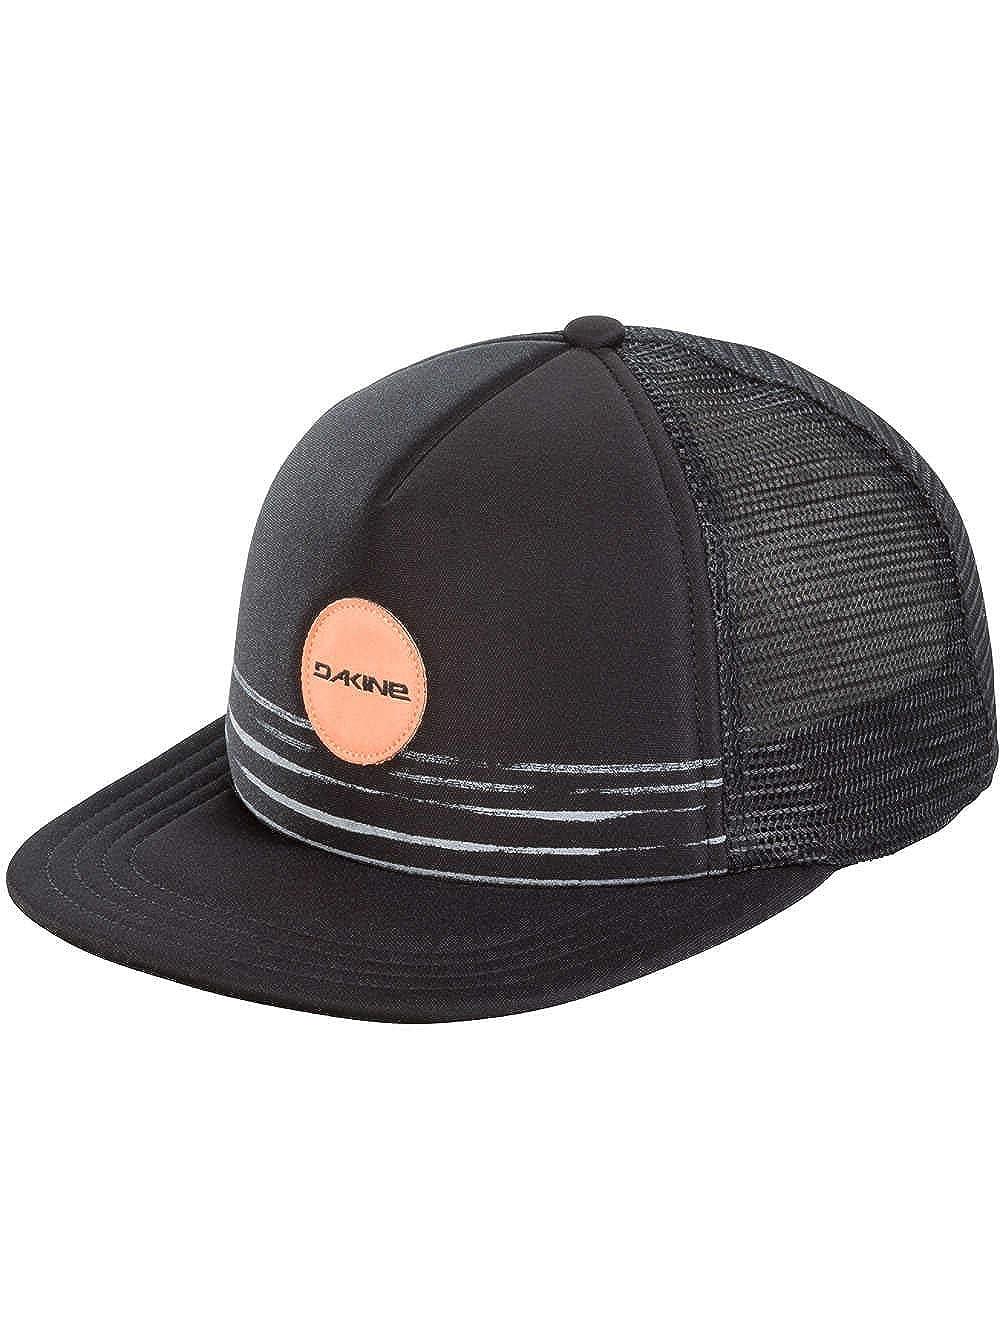 9cc5c74becb Amazon.com  Dakine Moonrise Trucker Hat - Women s Black